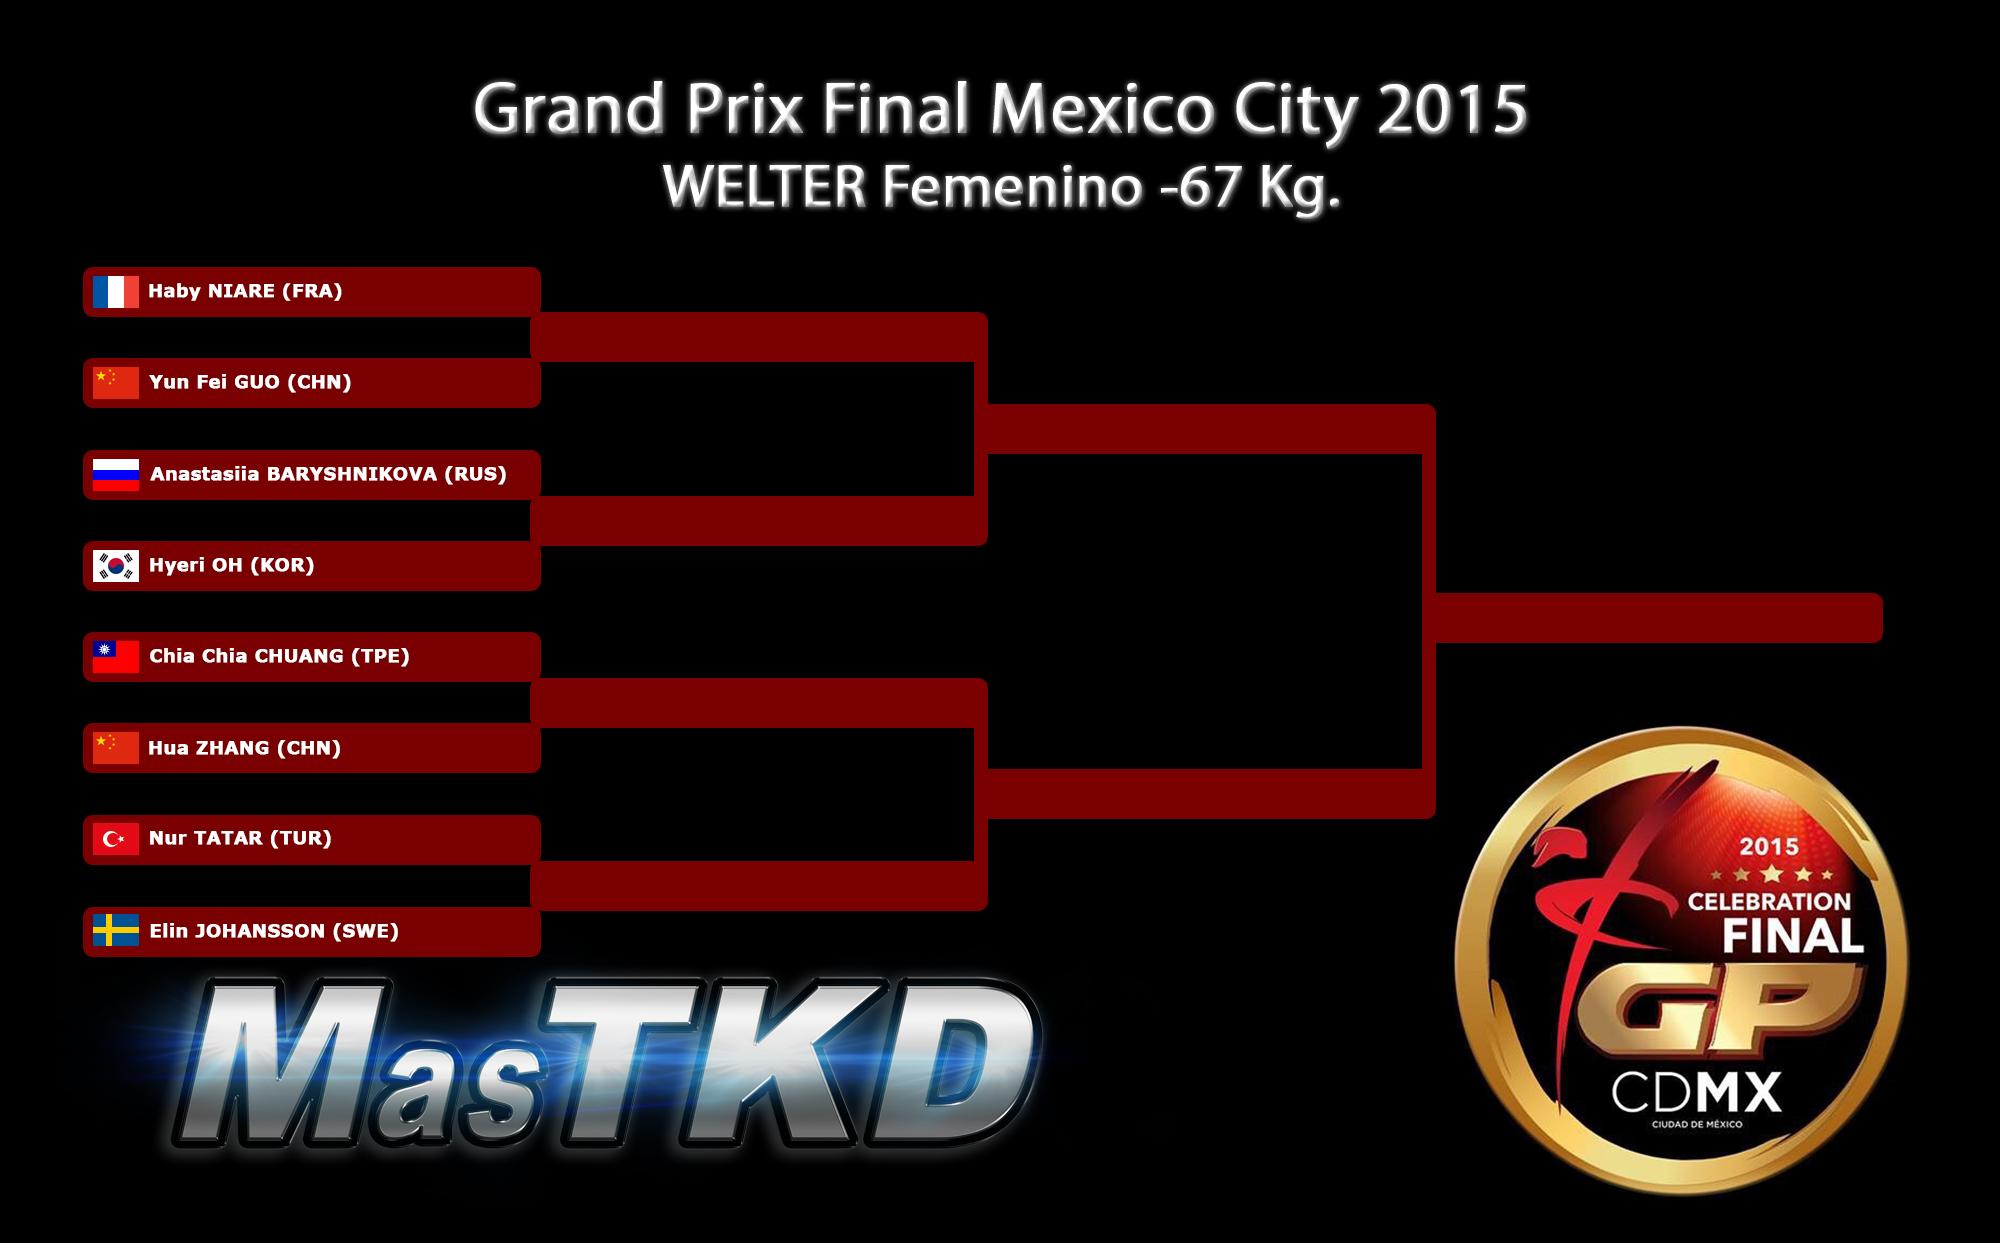 F-67_Grafica_GPFinal_MexicoCity2015